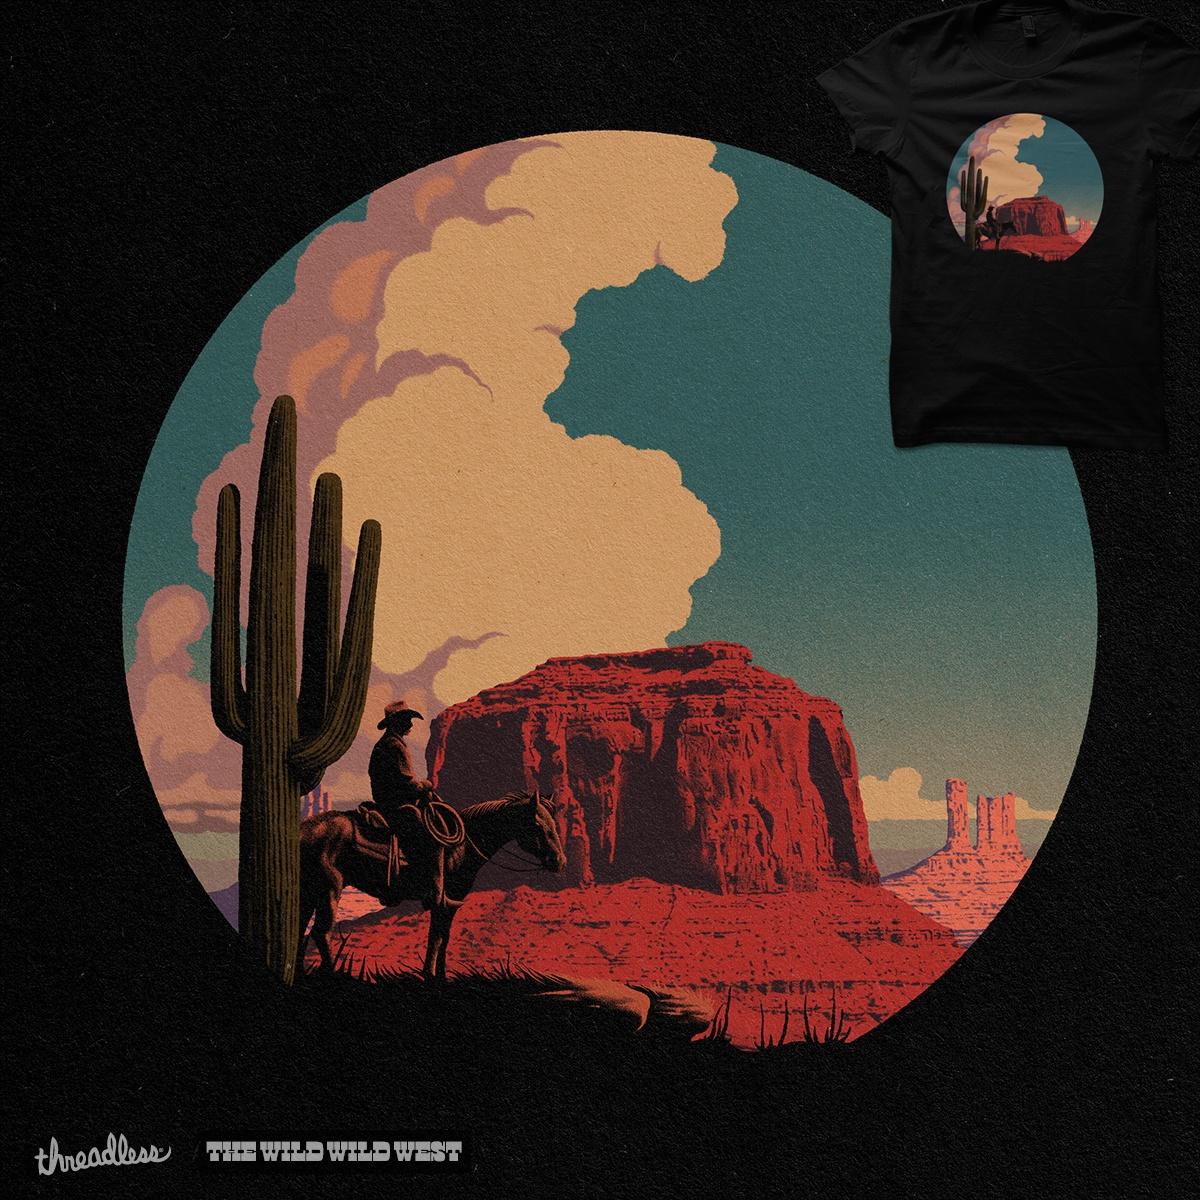 Desert Rider by khairulanam87 on Threadless